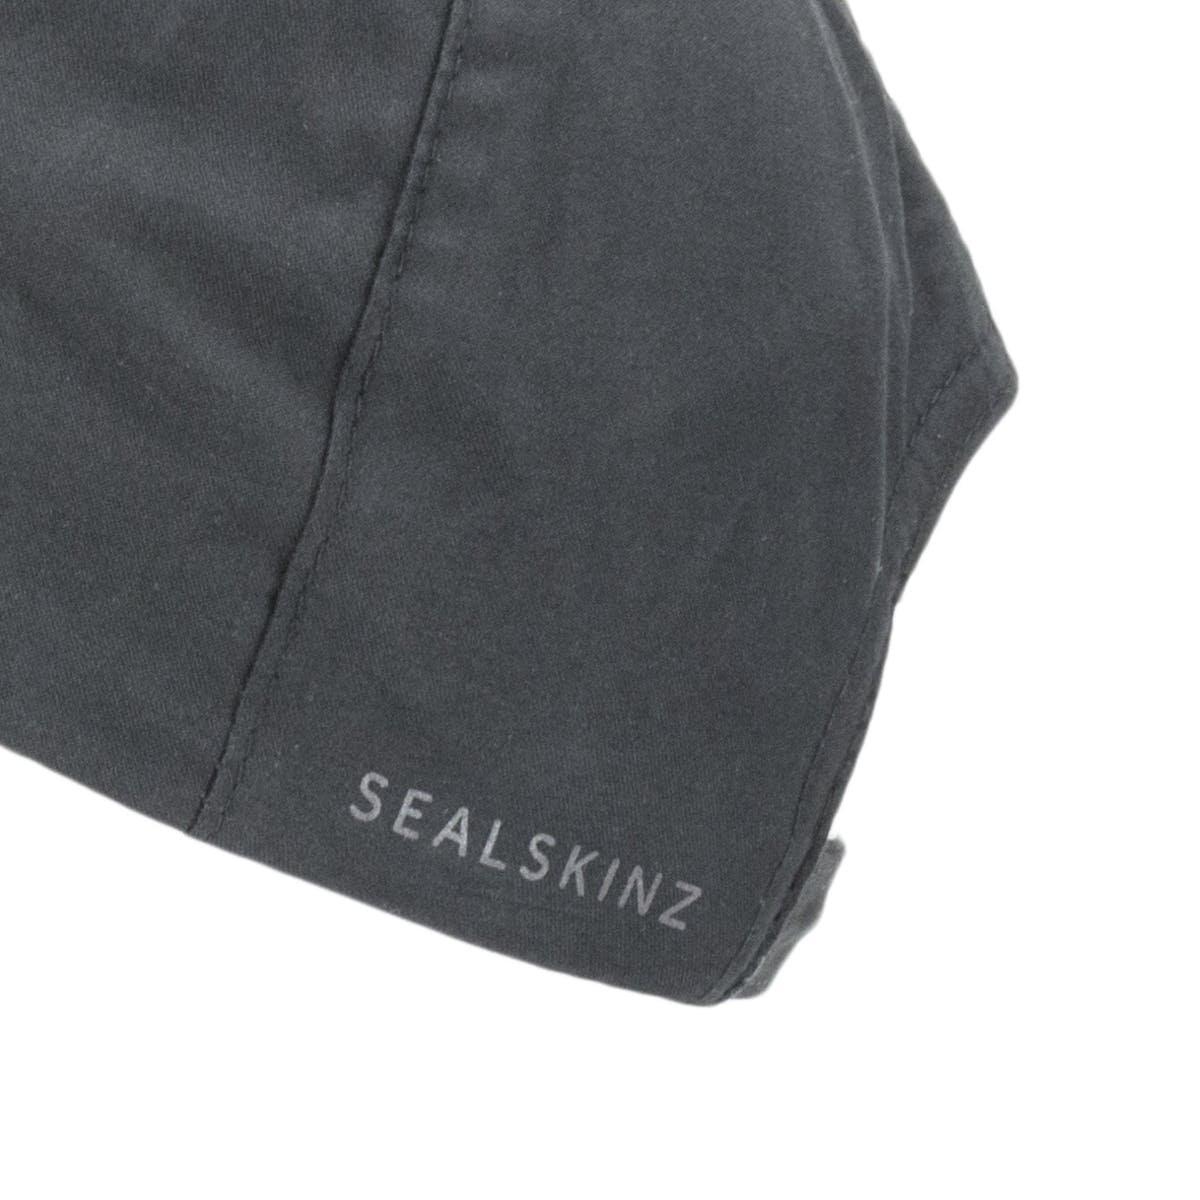 Sealskinz Unisex Waterproof All Weather Cap - Black